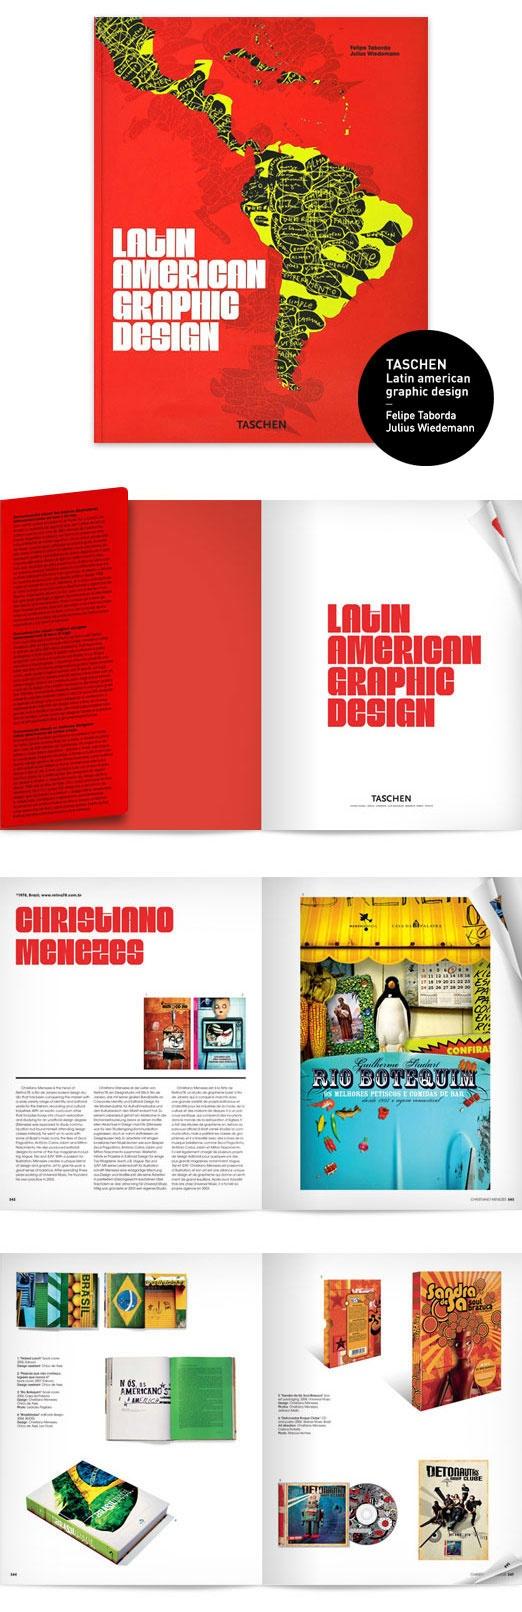 Graphic designers in latin America?